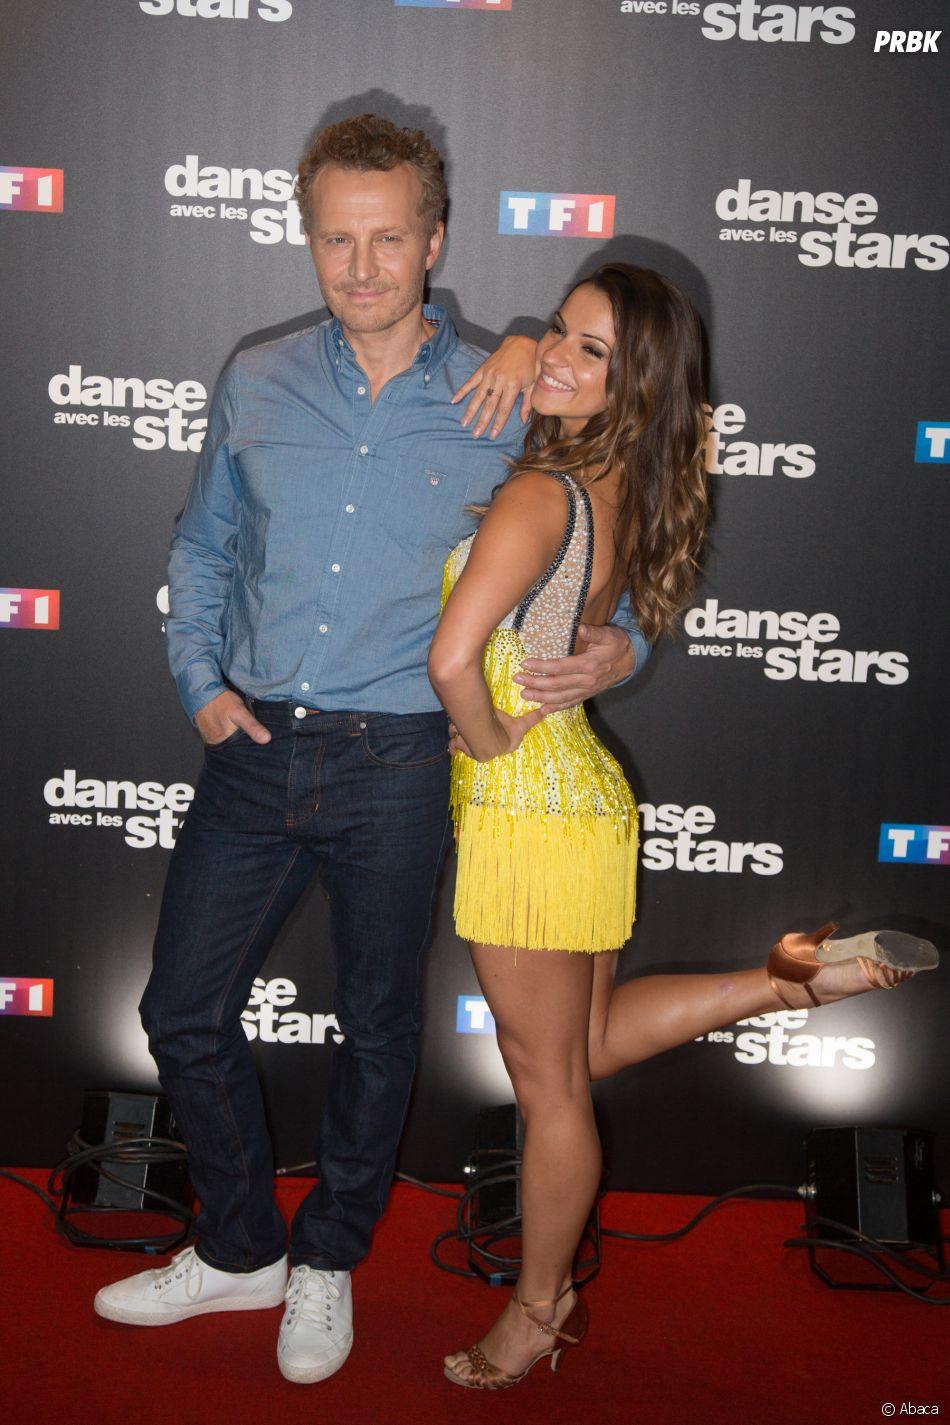 Danse avec les stars 8 : Sinclair et Denitsa Ikonomova danseront ensemble !